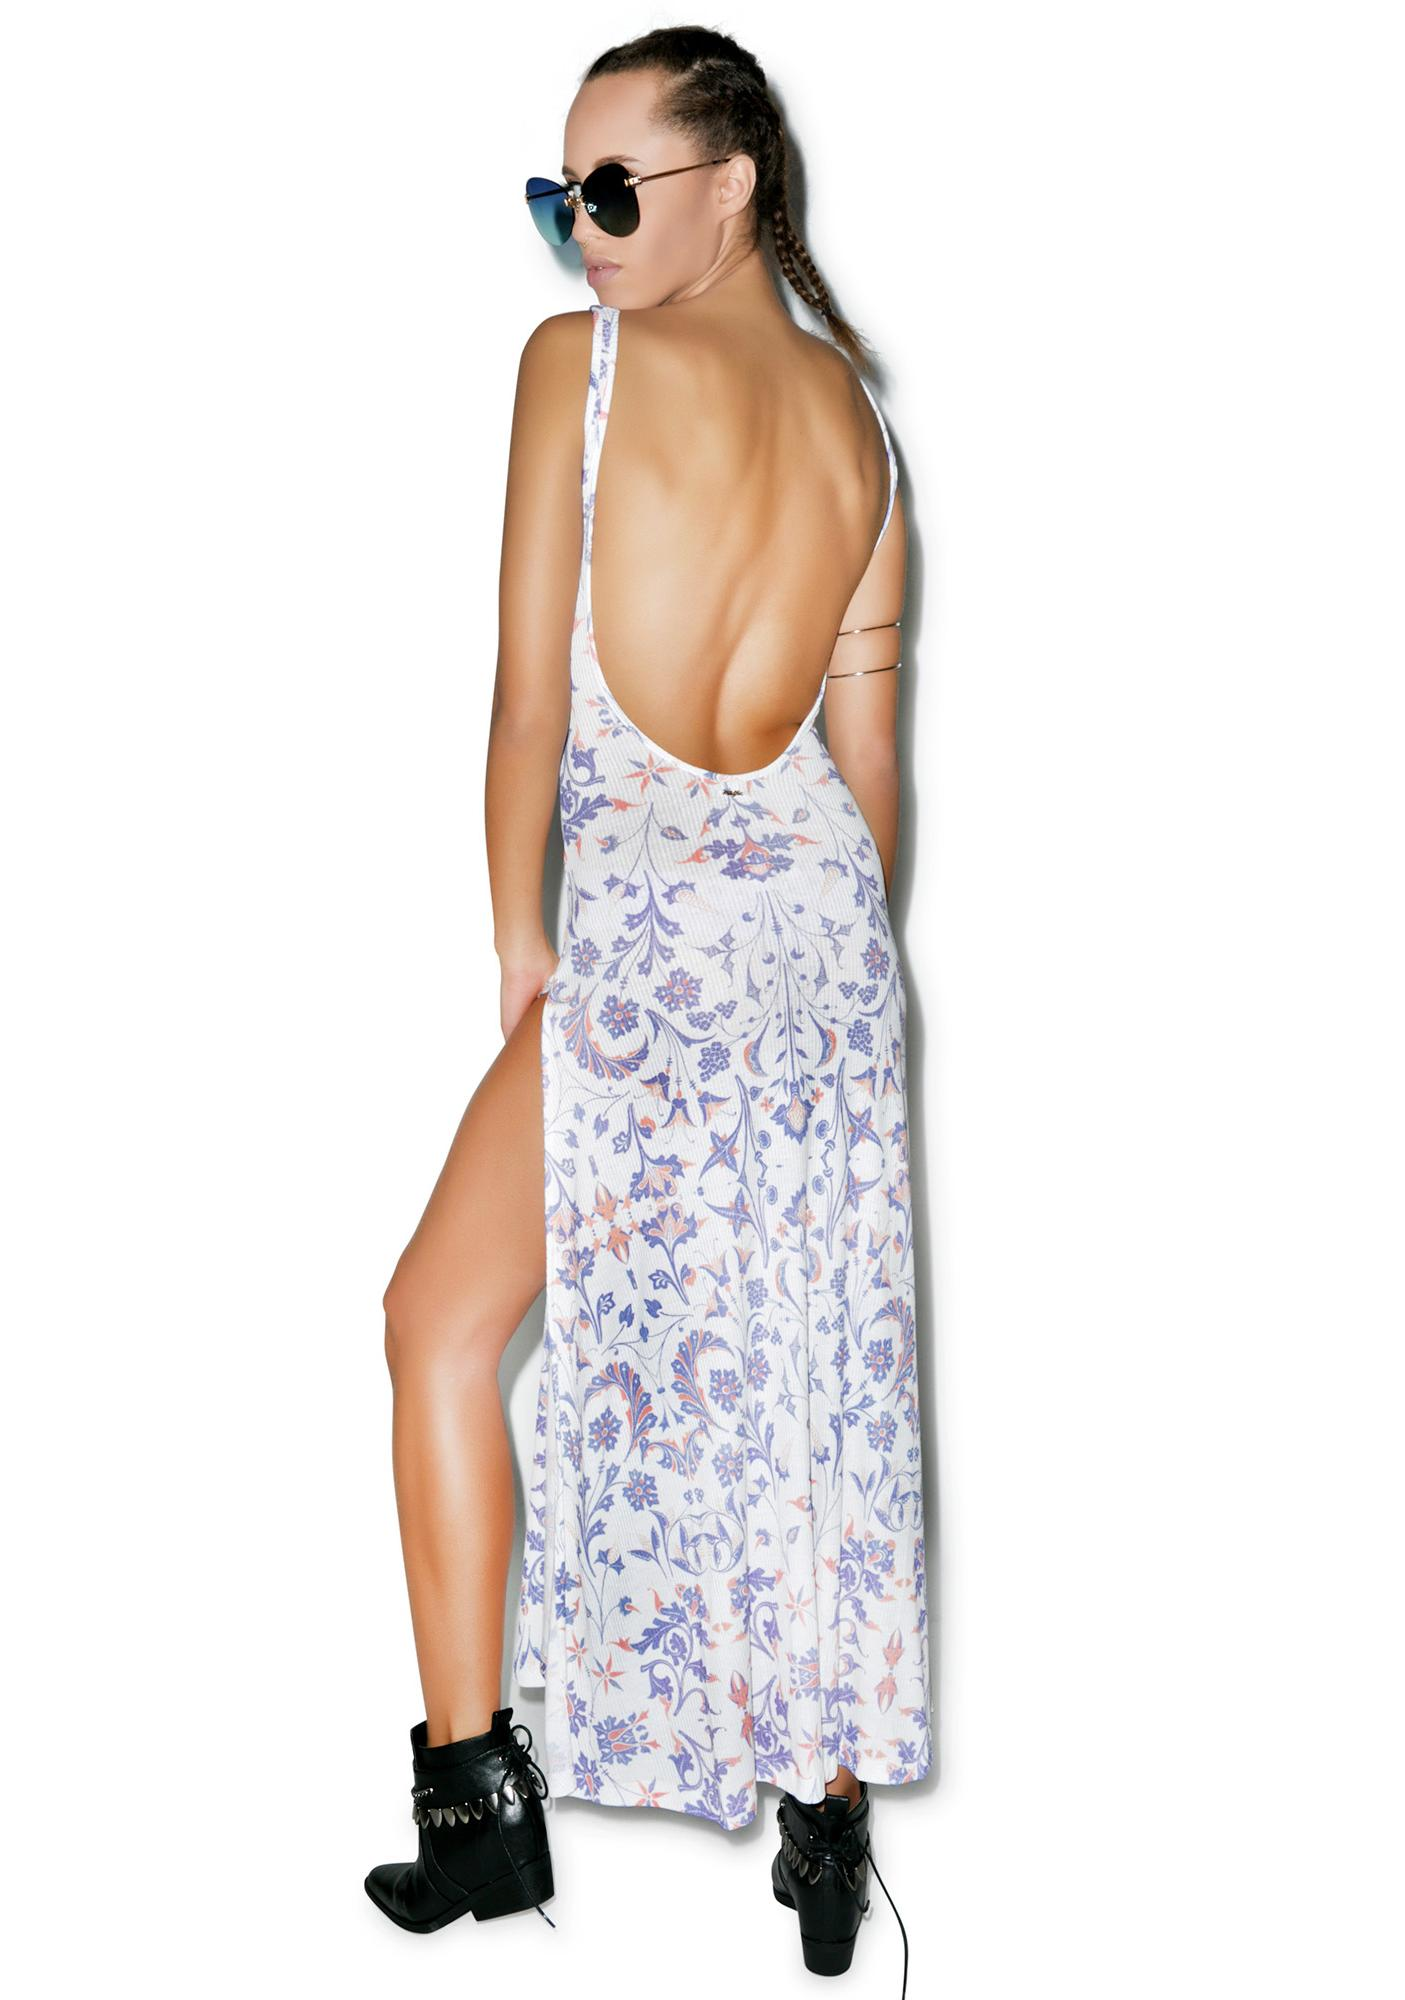 Wildfox Couture American Paisley Maldives Maxi